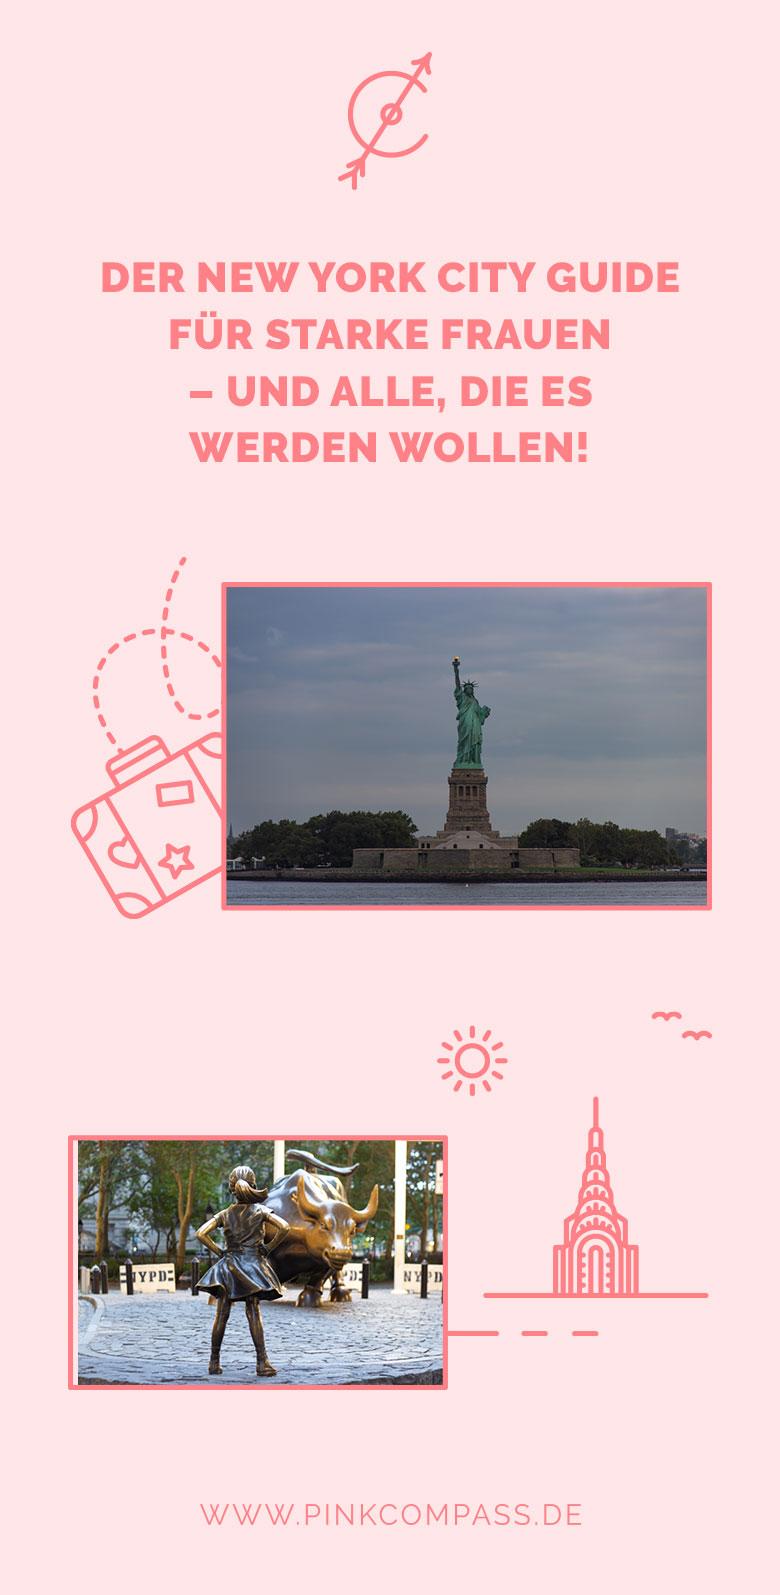 NYC-Guide-fuer-Feministinnen